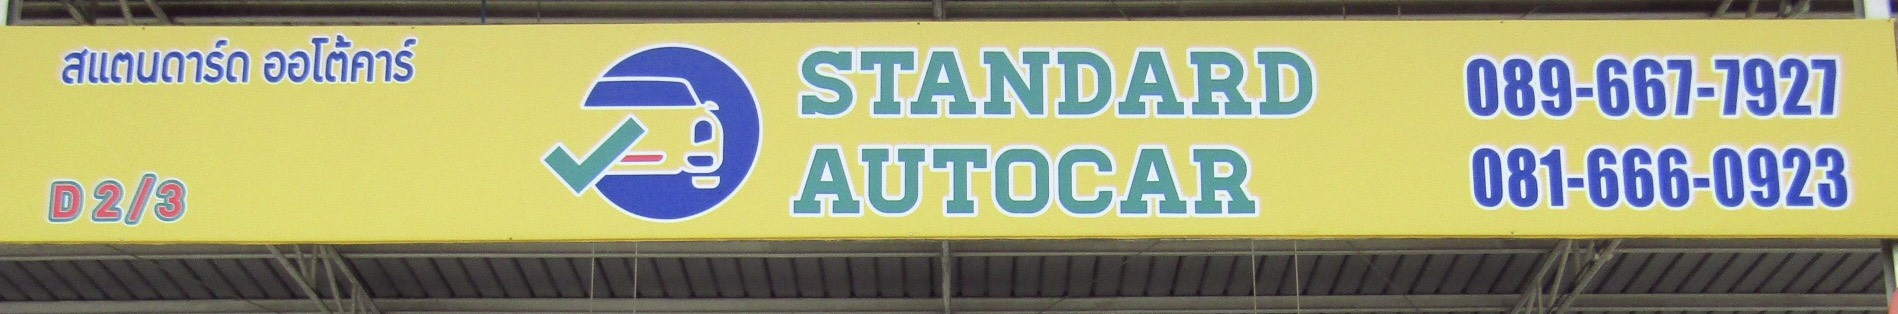 STANDARD AUTOCAR